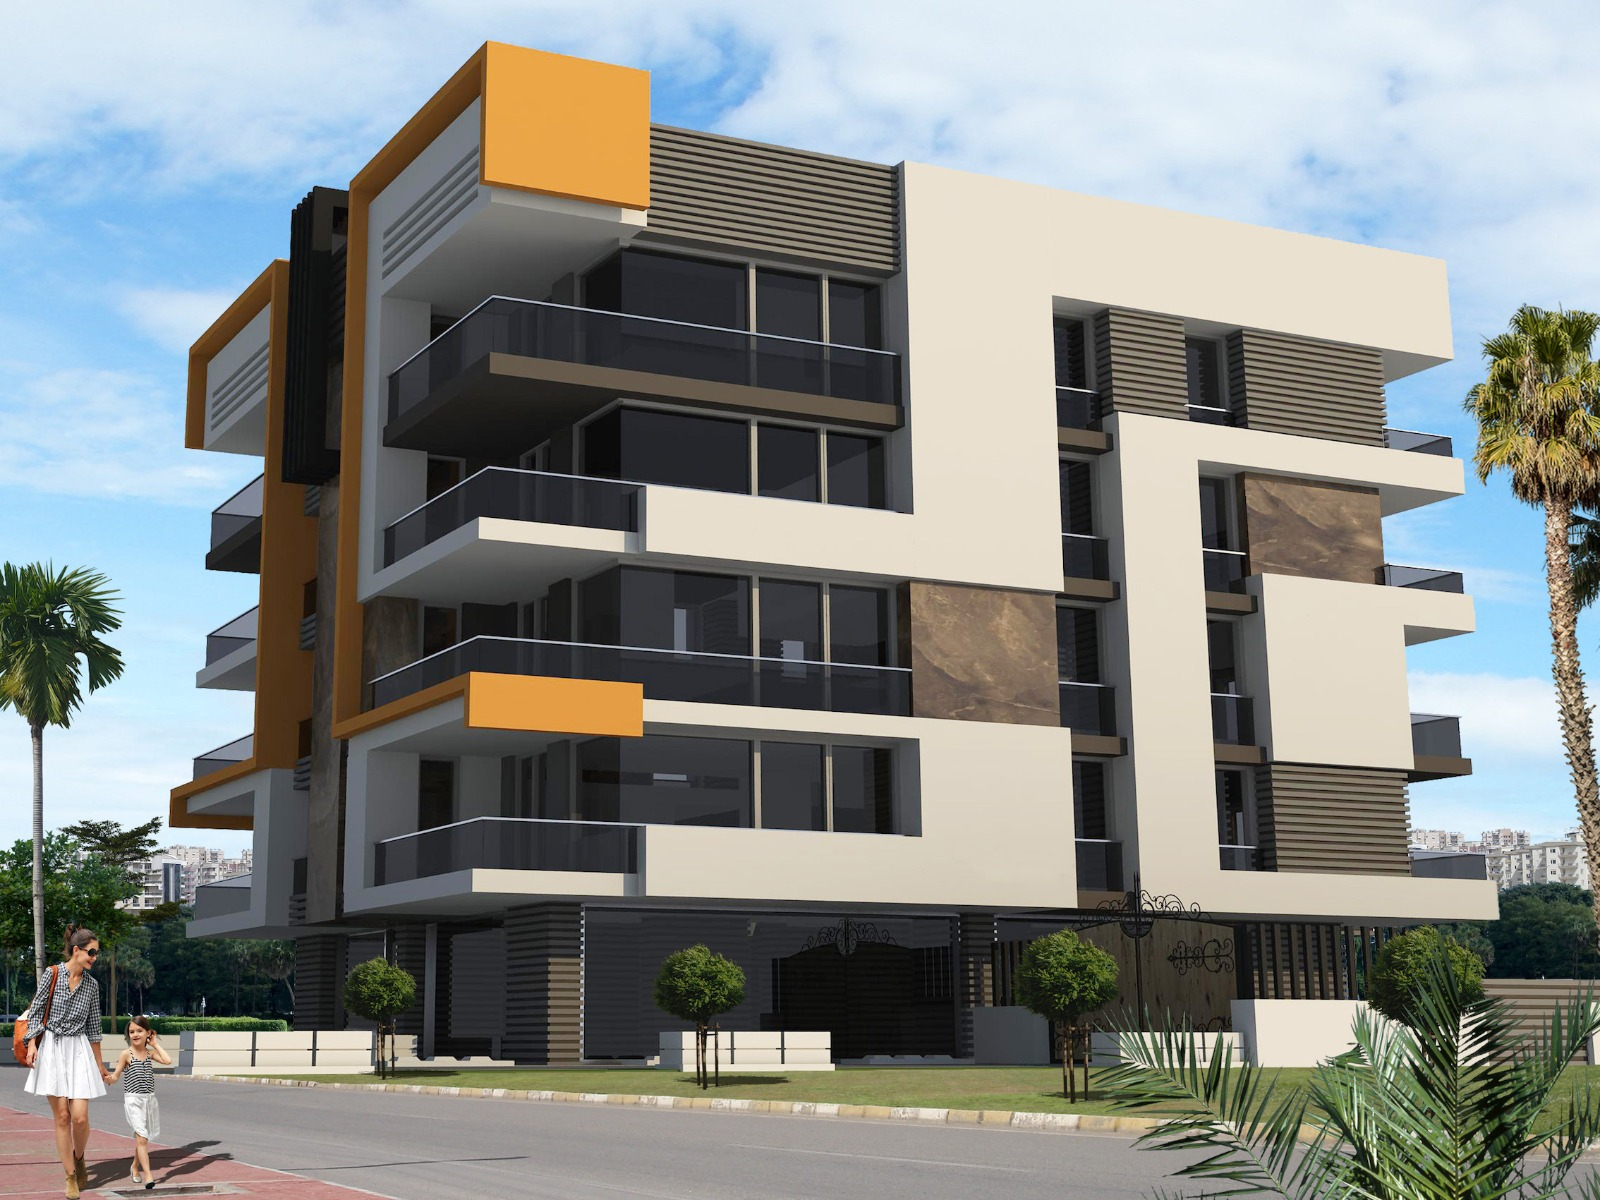 Yali Residence (3+1) — Продается ПОСЛЕДНЯЯ КВАРТИРА в доме в 150м от пляжа в Коньяалты (Анталия)